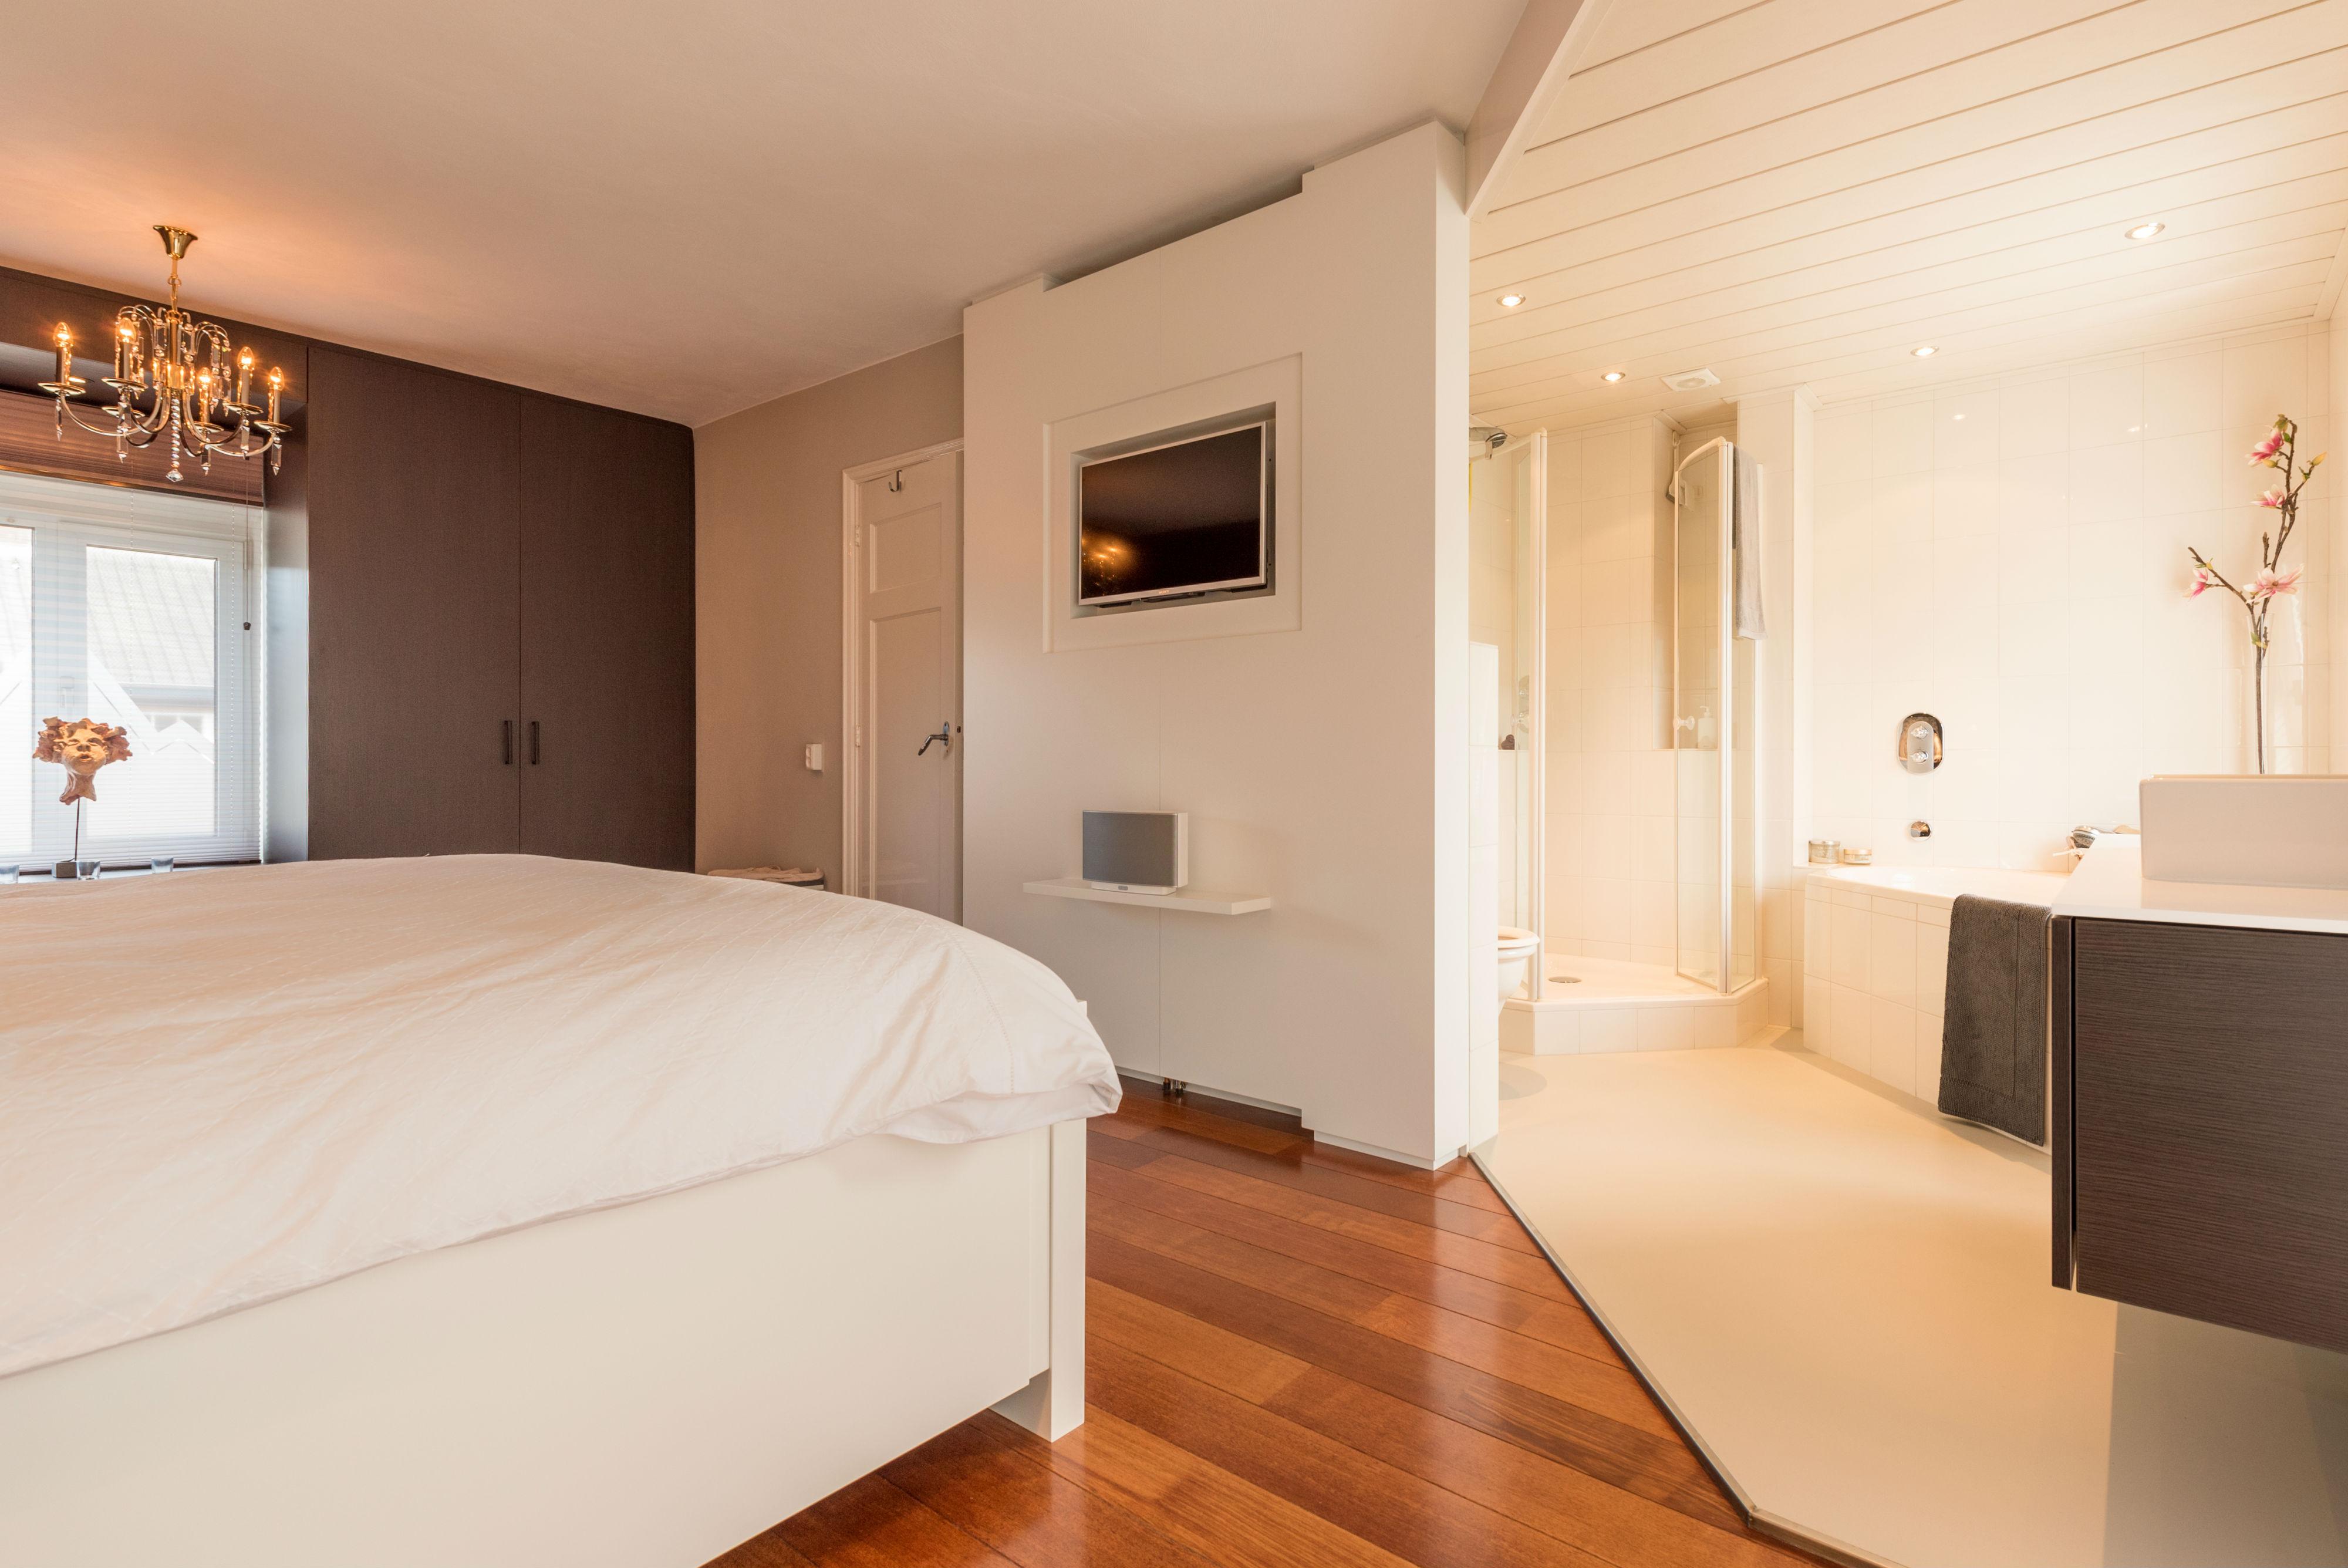 slaap - badkamer eindhoven - jamo restiau, Deco ideeën